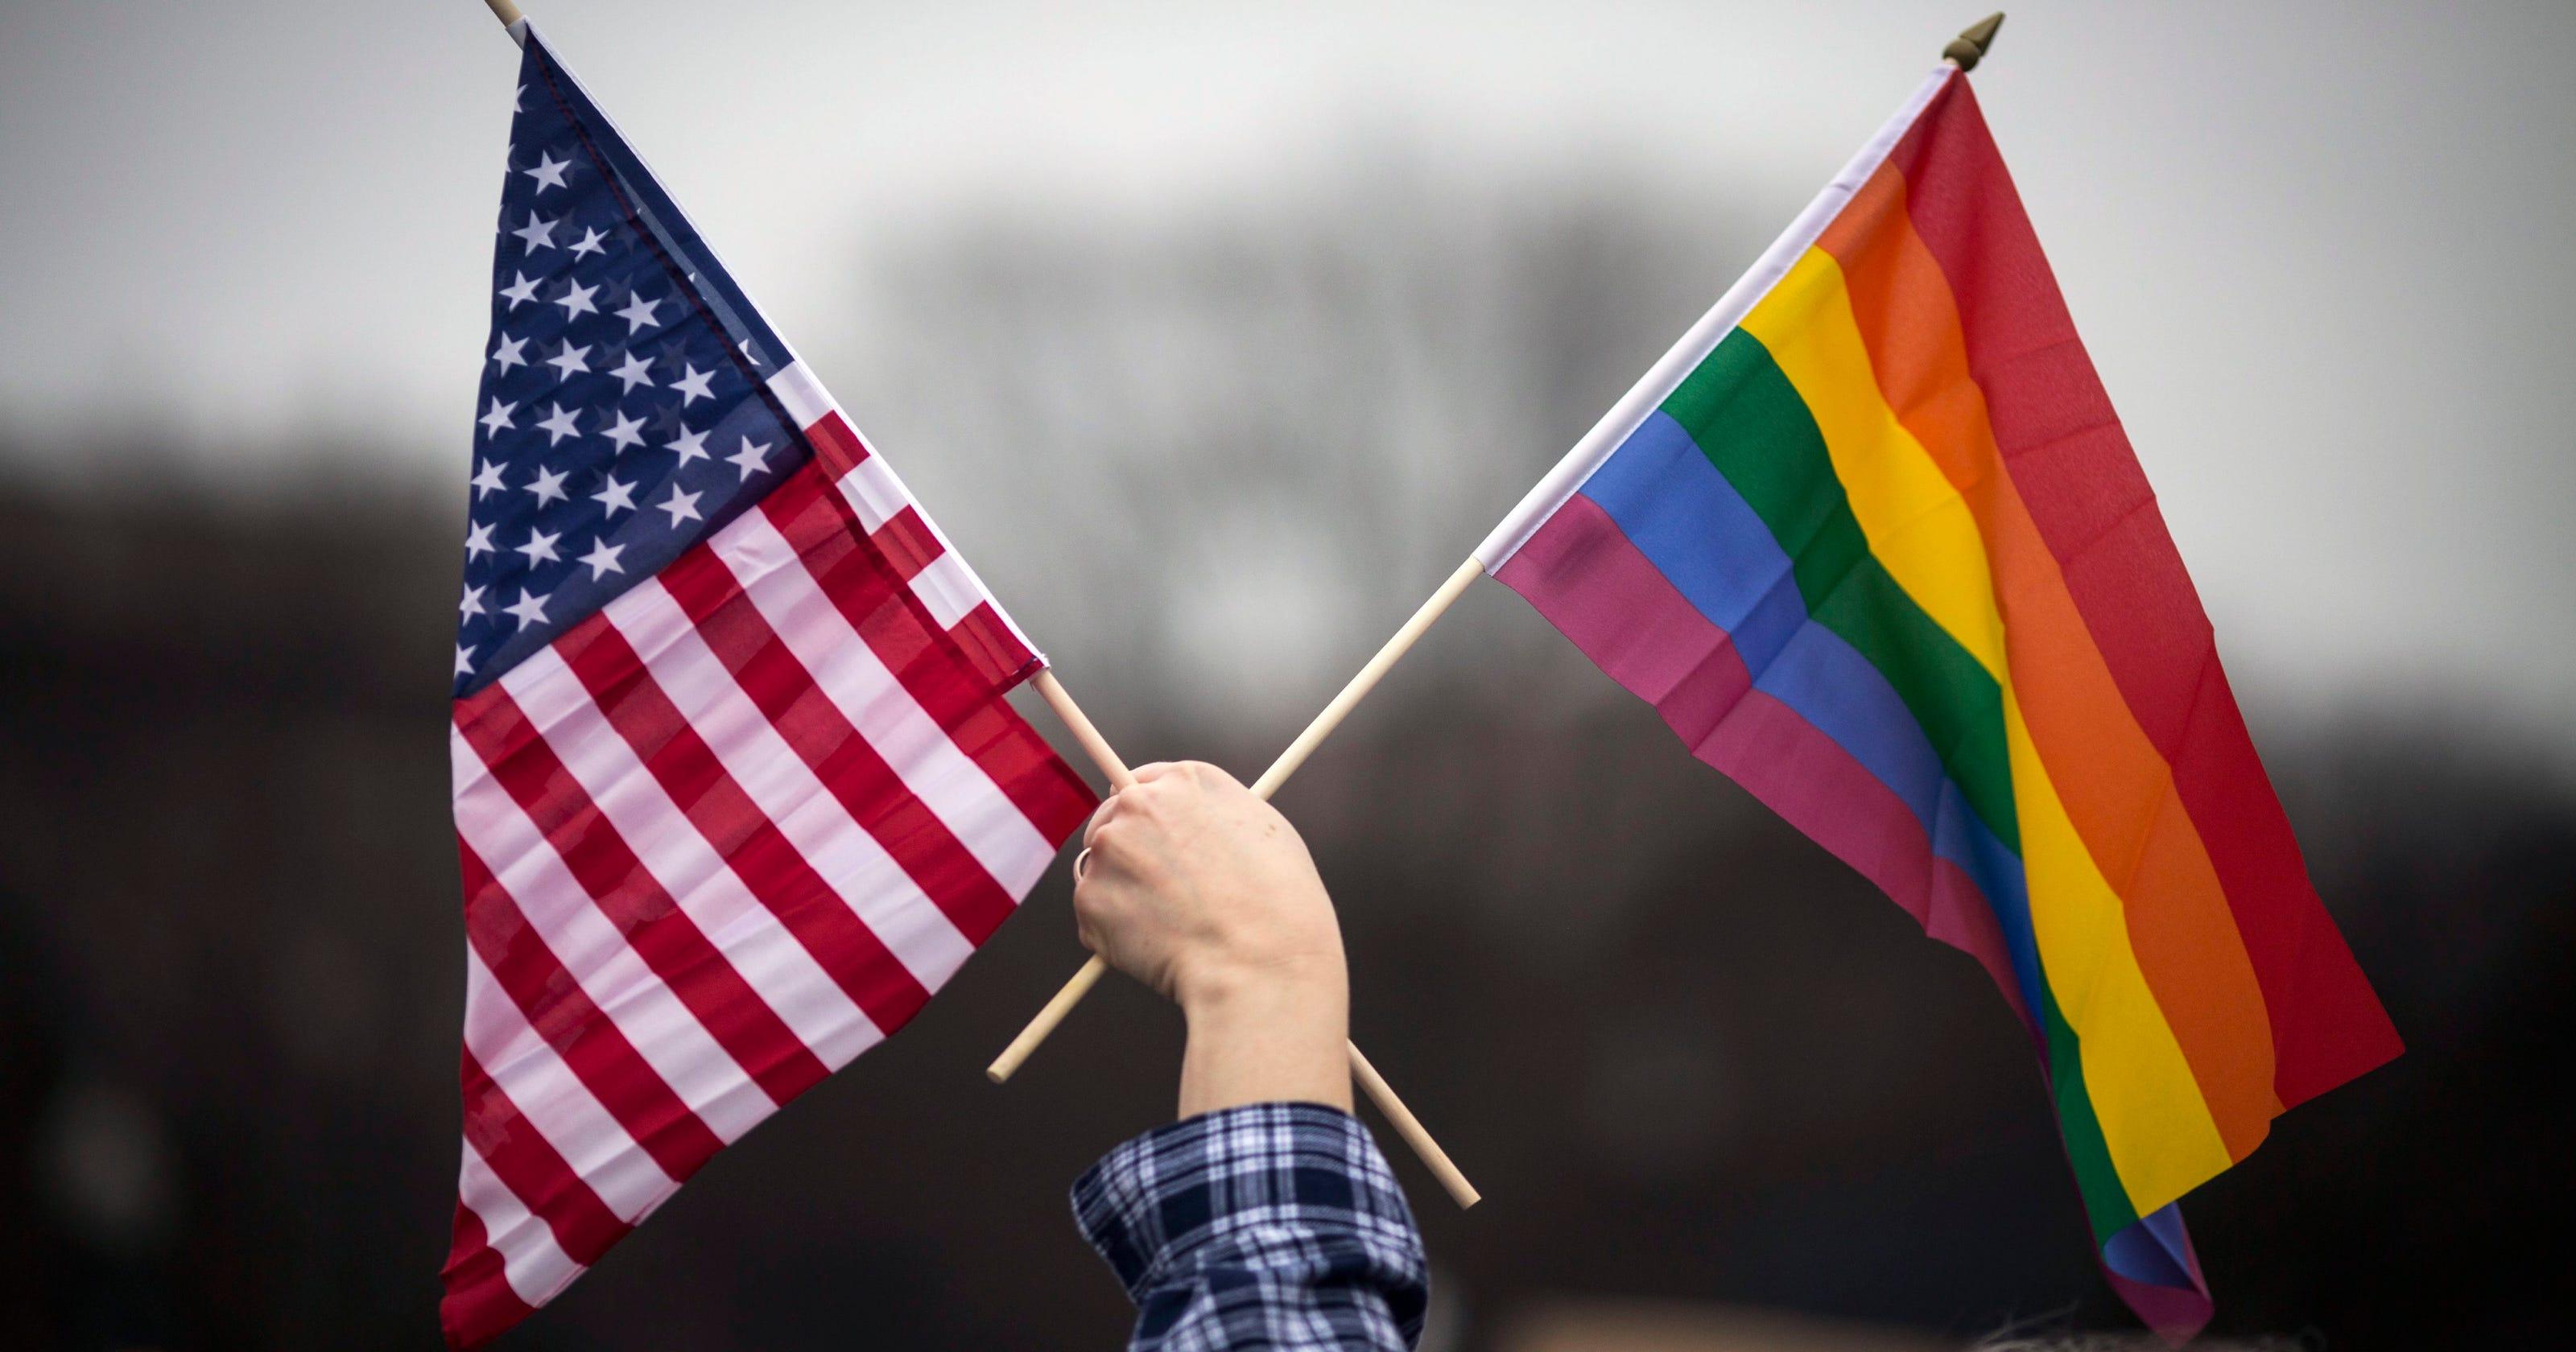 Log Cabin Republicans chair: LGBT Americans belong in Donald Trump's Republican Party